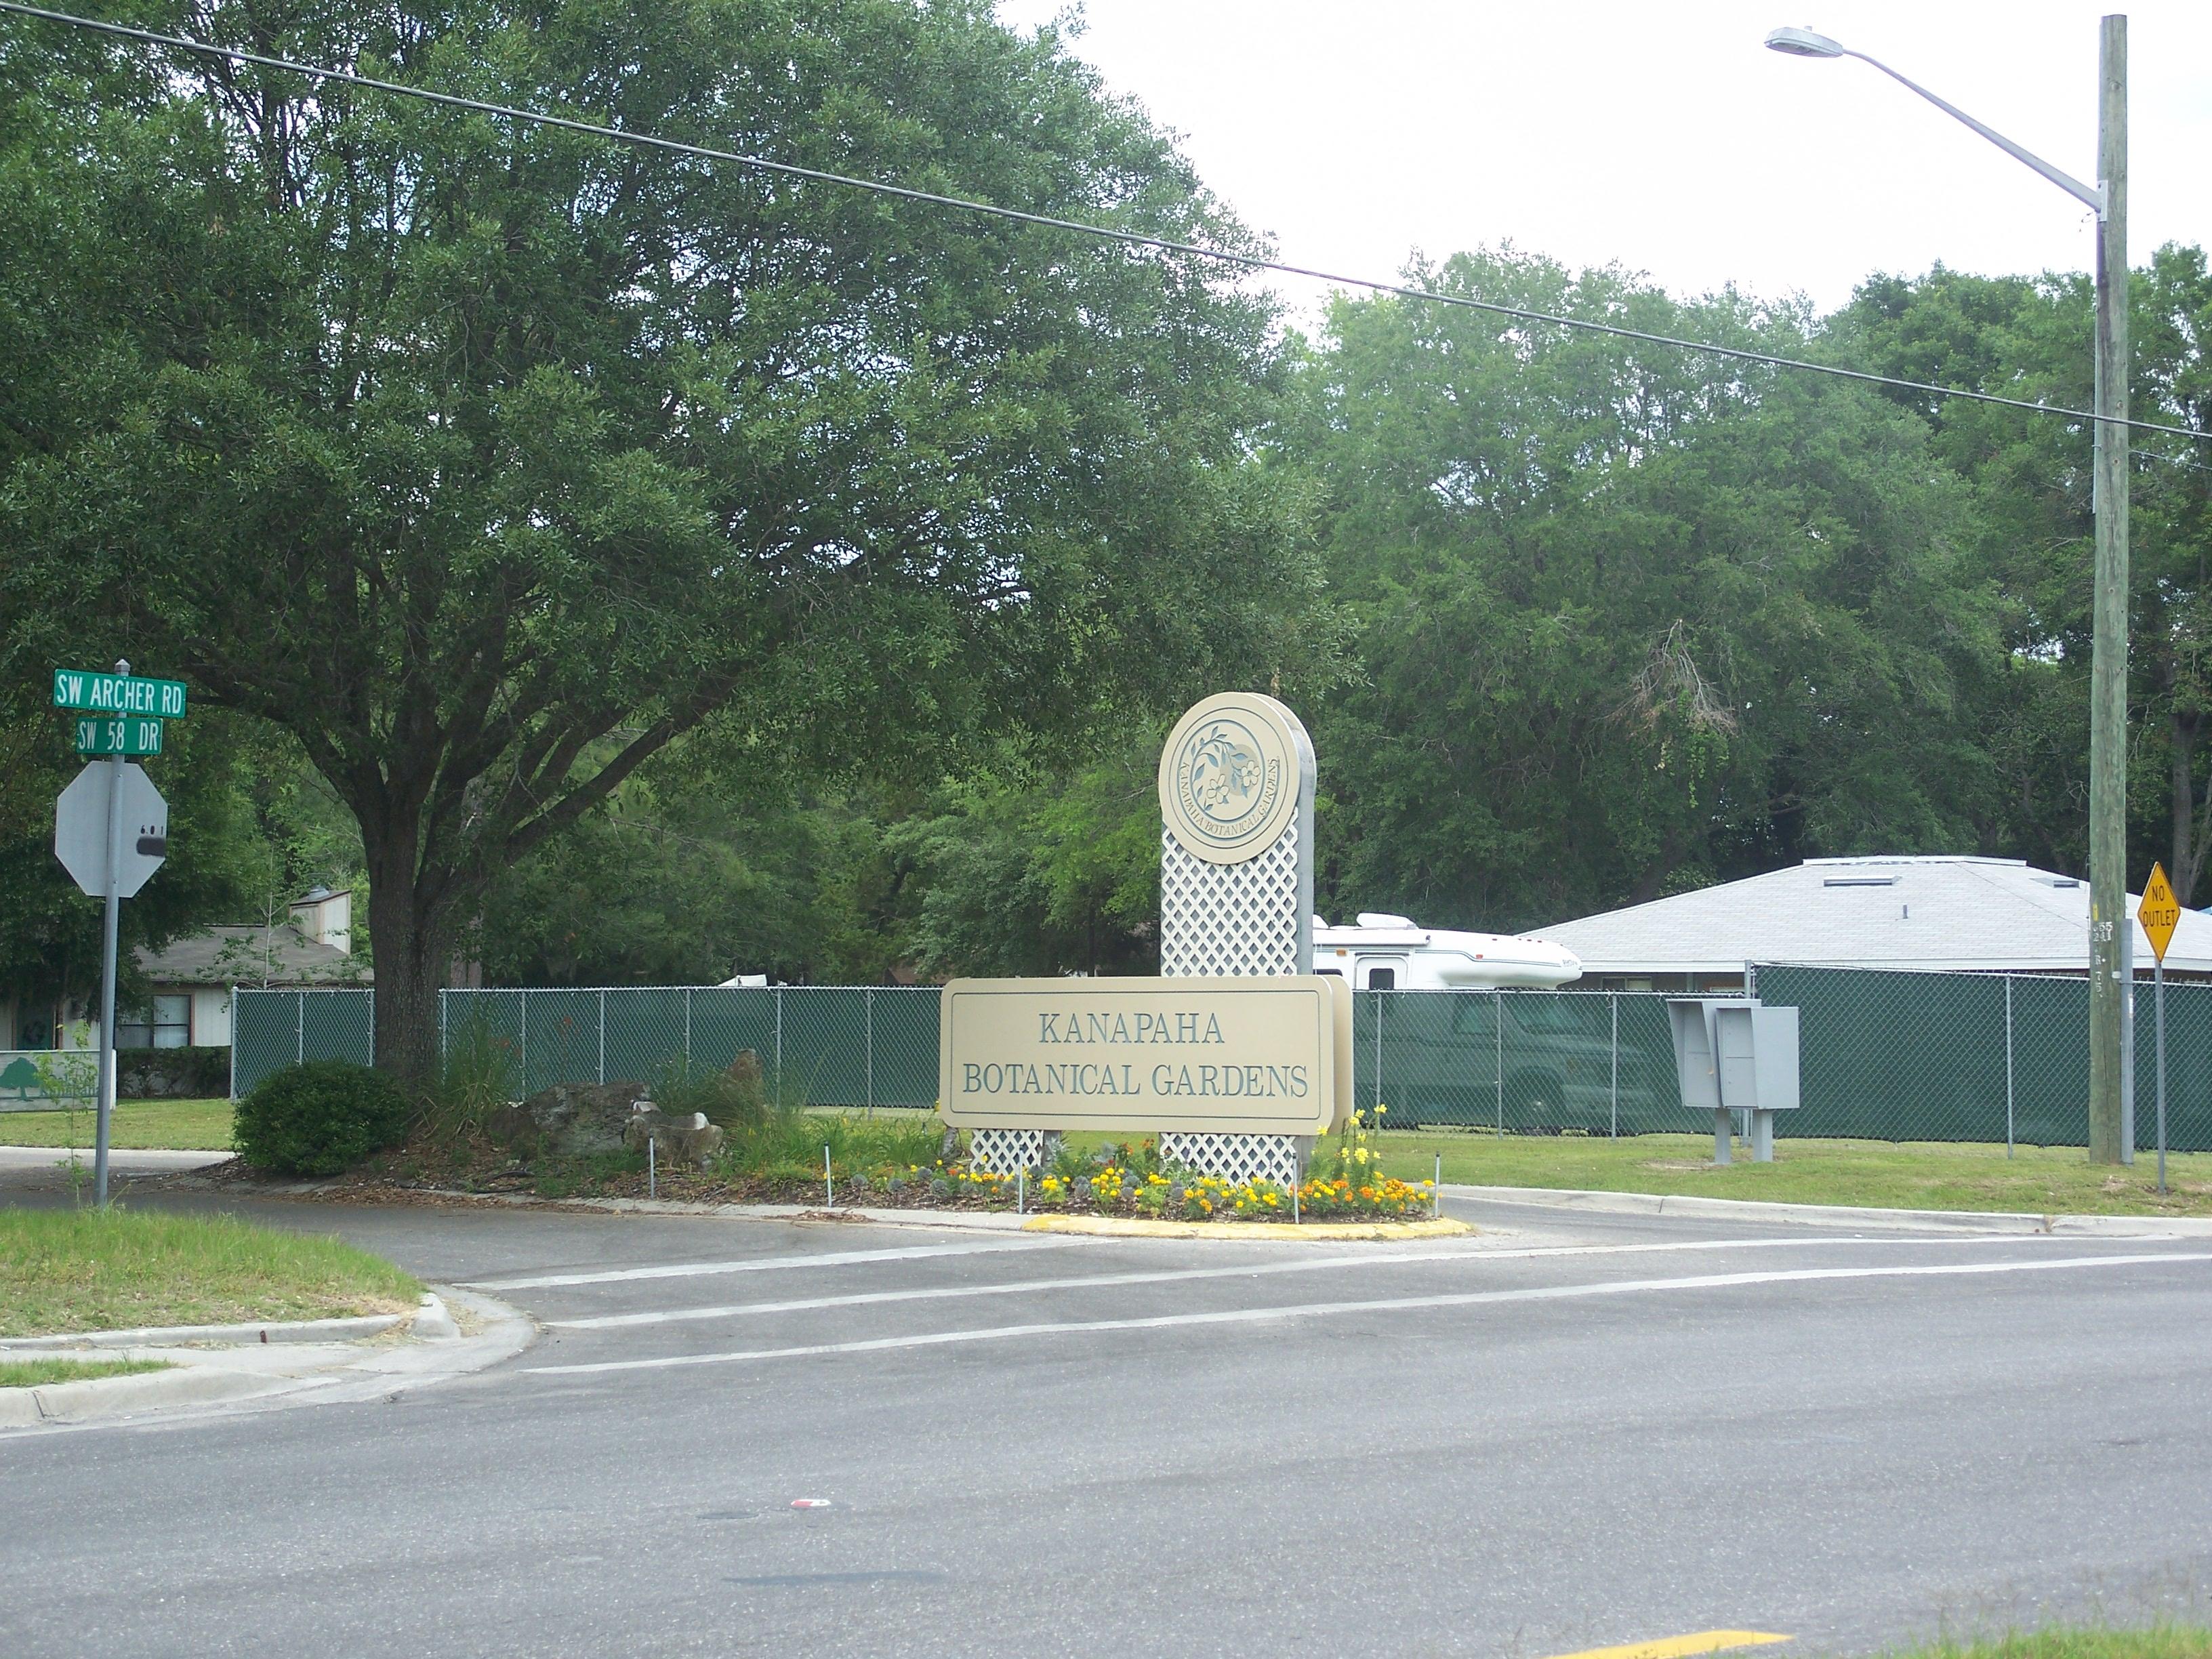 File:Gainesville FL Kanapaha Botanical Gardens Sign01